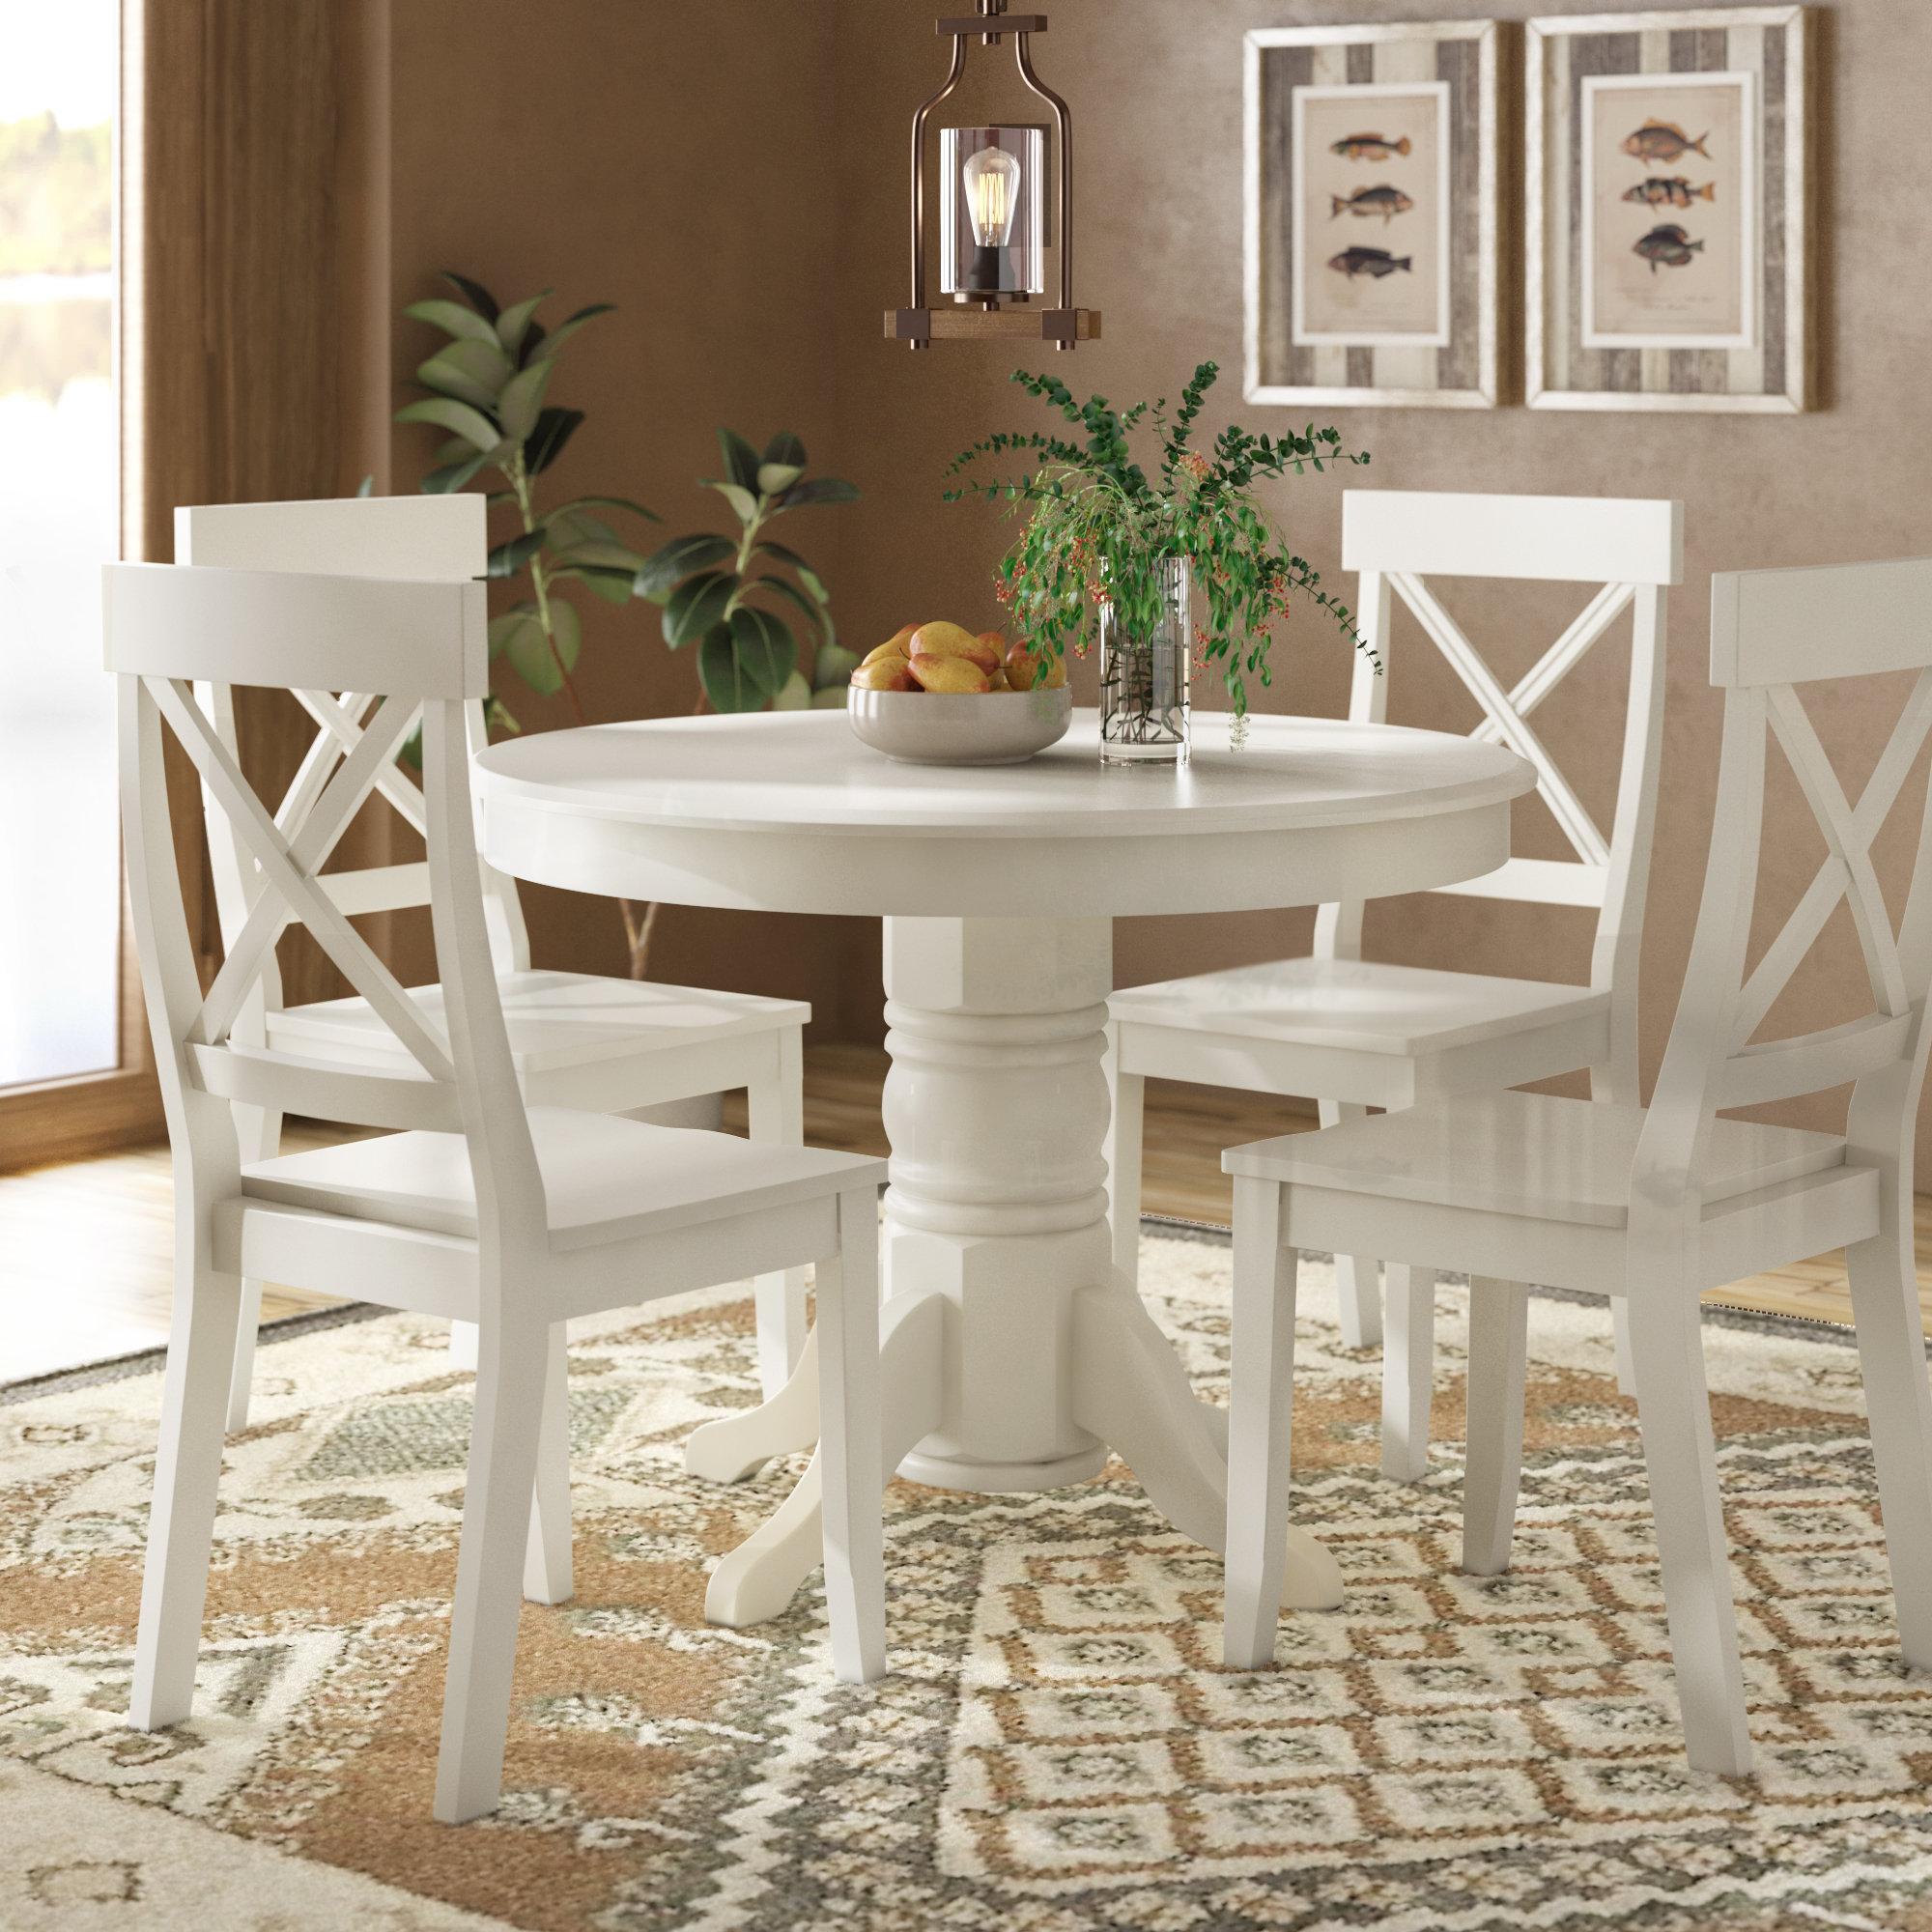 Standridge 9 - Piece Solid Wood Dining Set